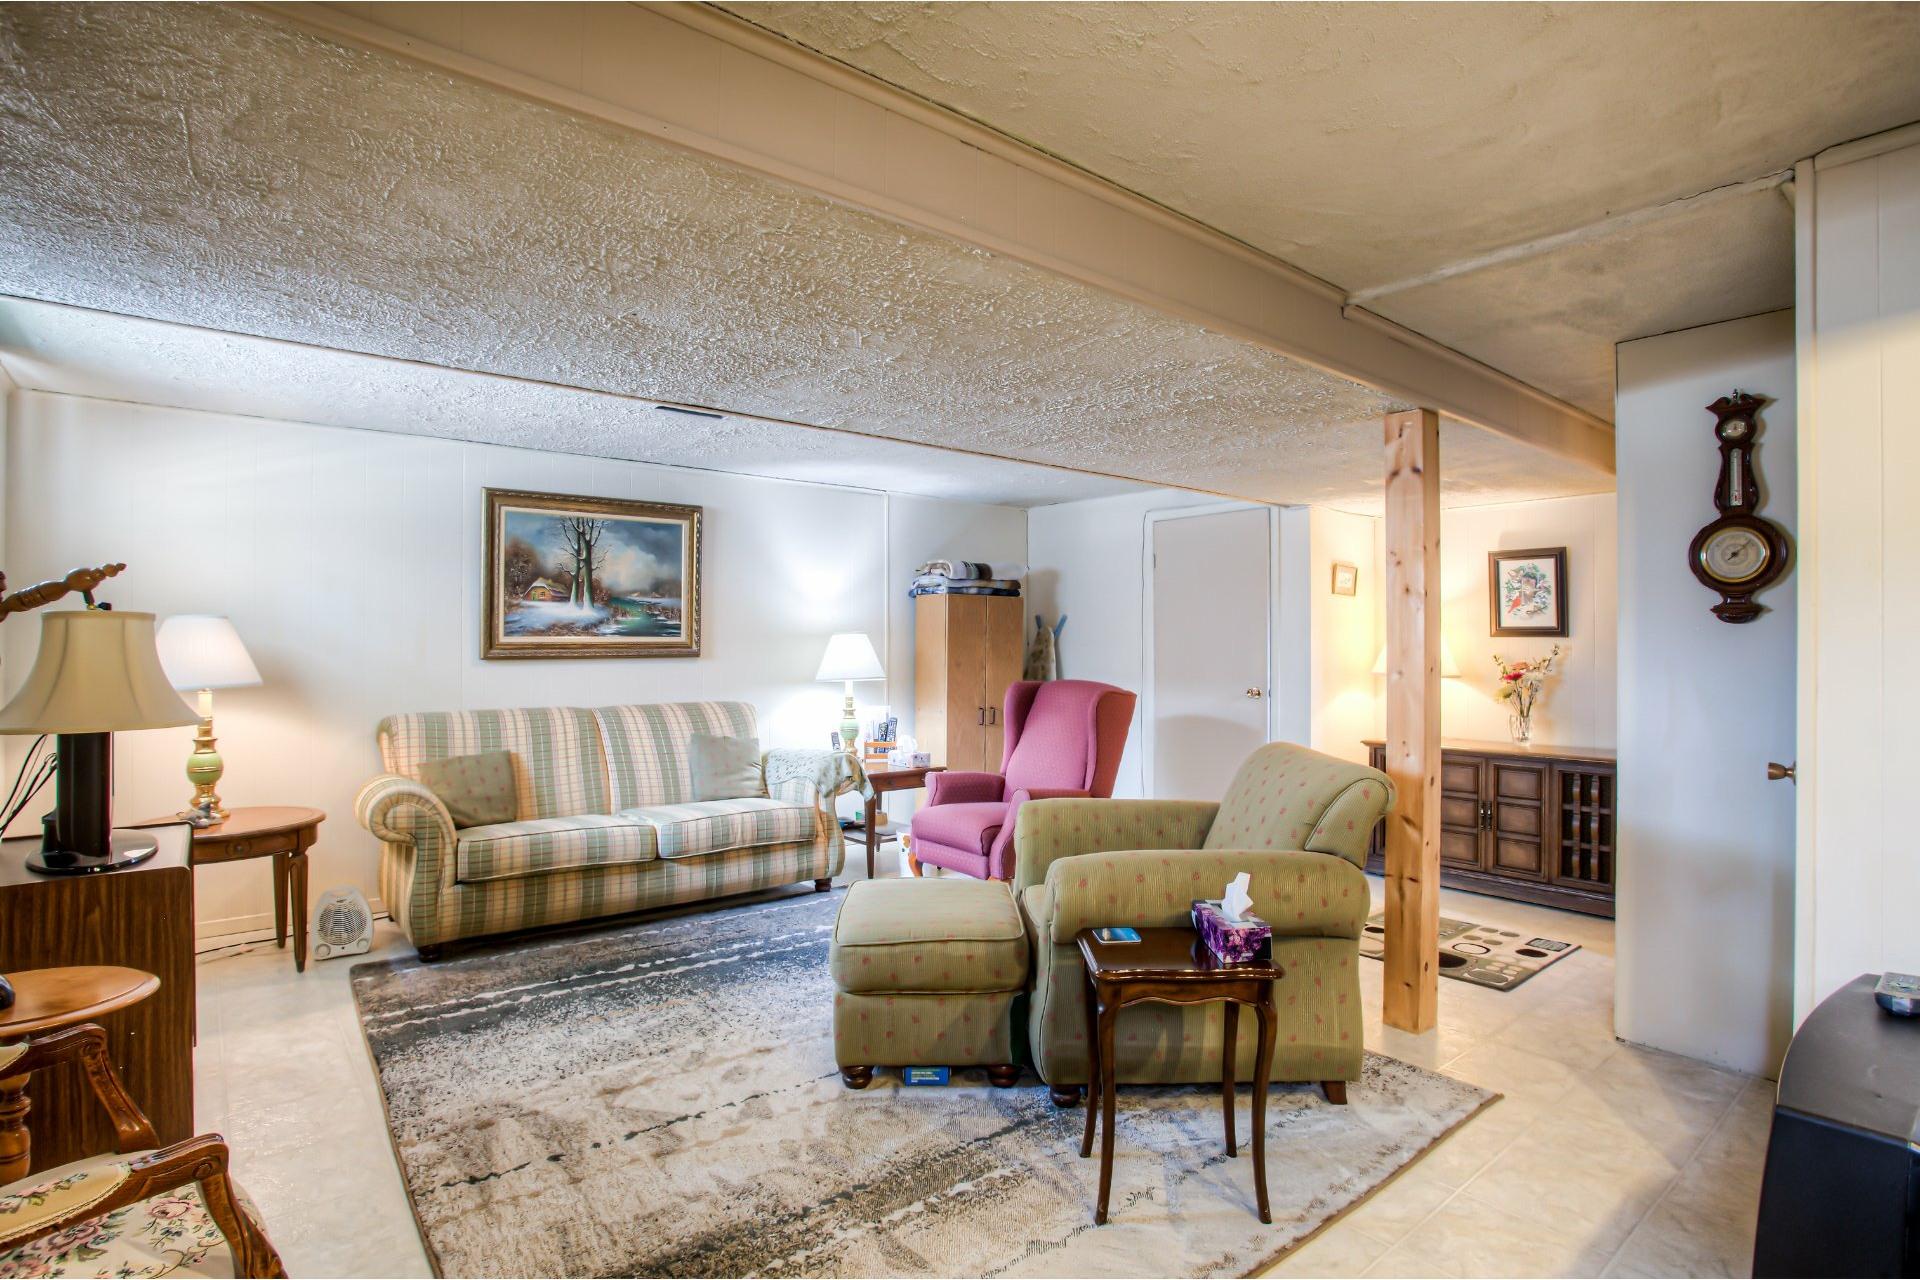 image 14 - House For sale Pierrefonds-Roxboro Montréal  - 10 rooms